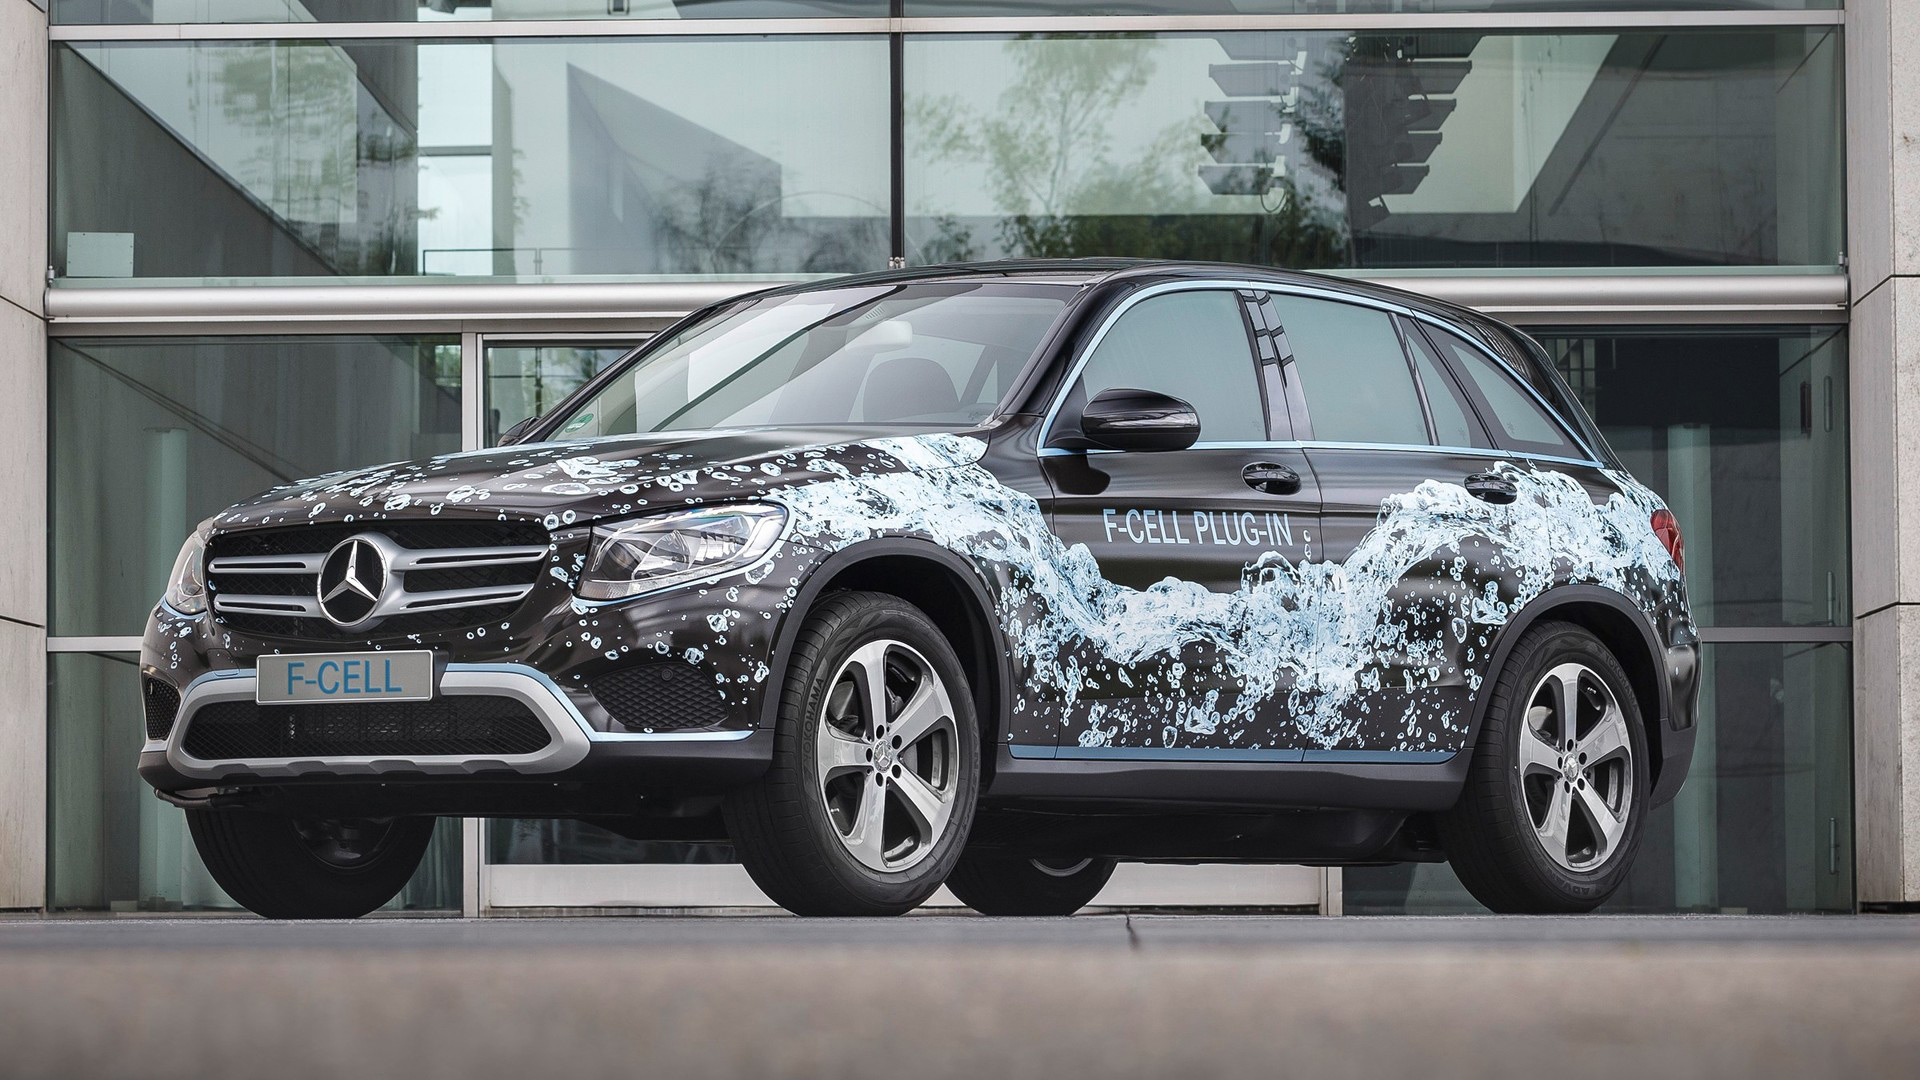 Electric-car sales, plug-in Mercedes fuel-cell SUV, VW diesel delay: The Week in Reverse